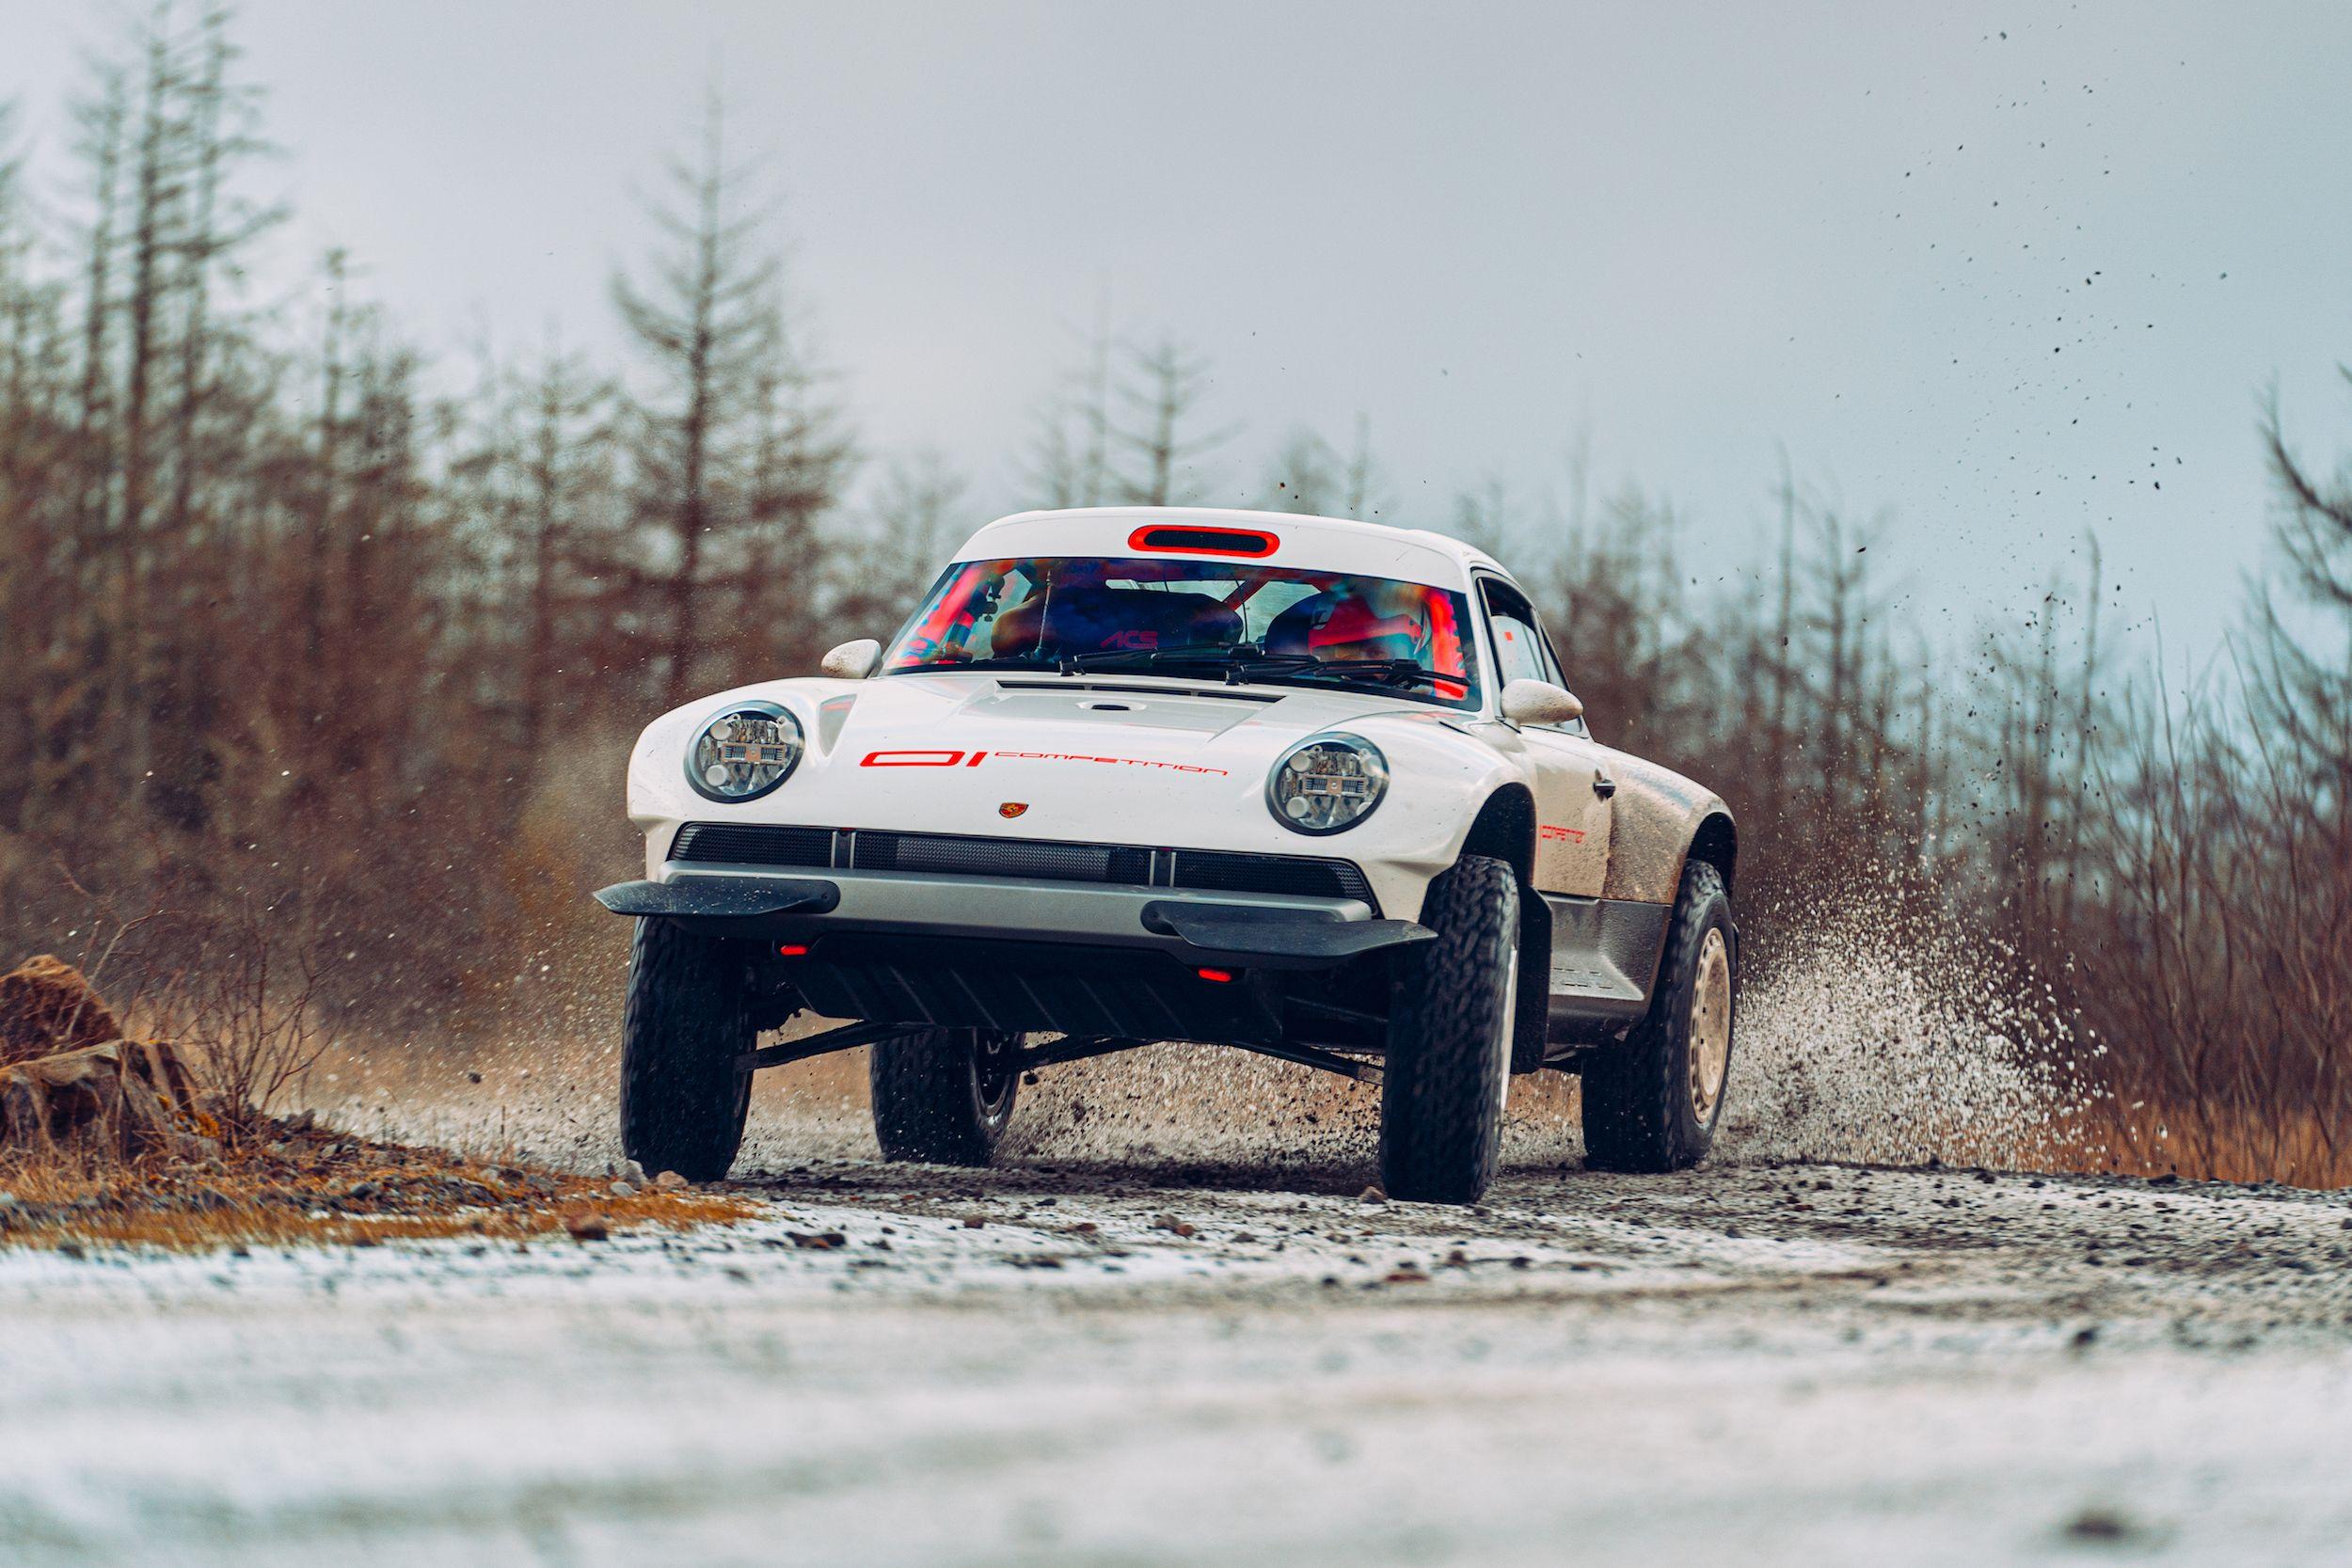 Singer S Latest Build Evokes The Ultimate 80s Porsche The 959